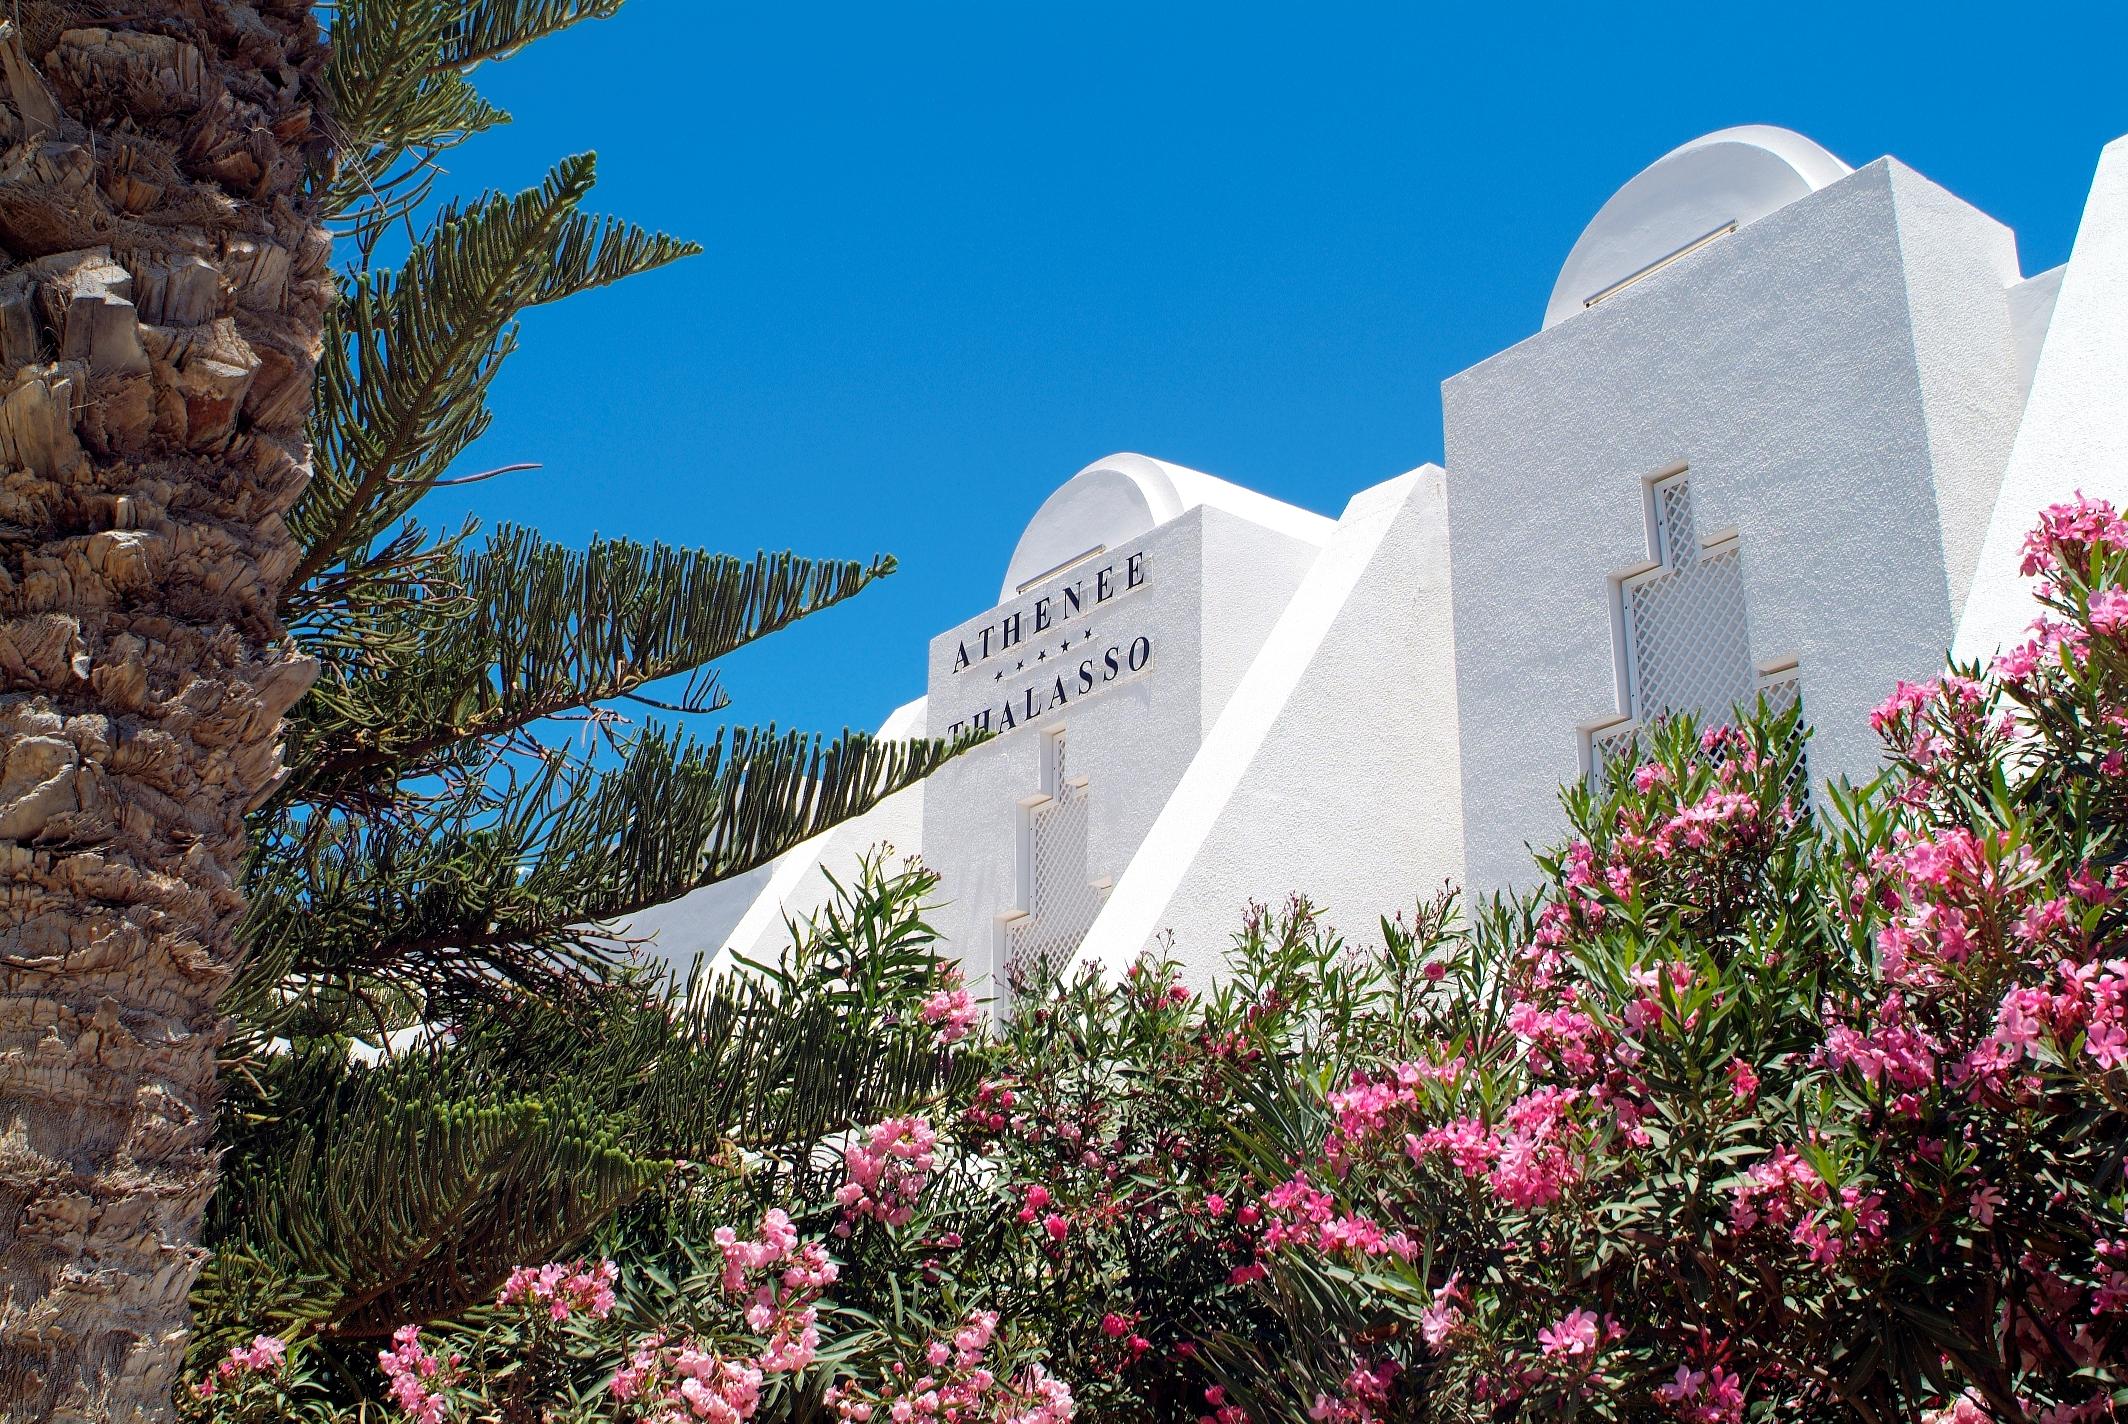 Athenee Thalasso - entrée du Radisson Blu Palace à Djerba